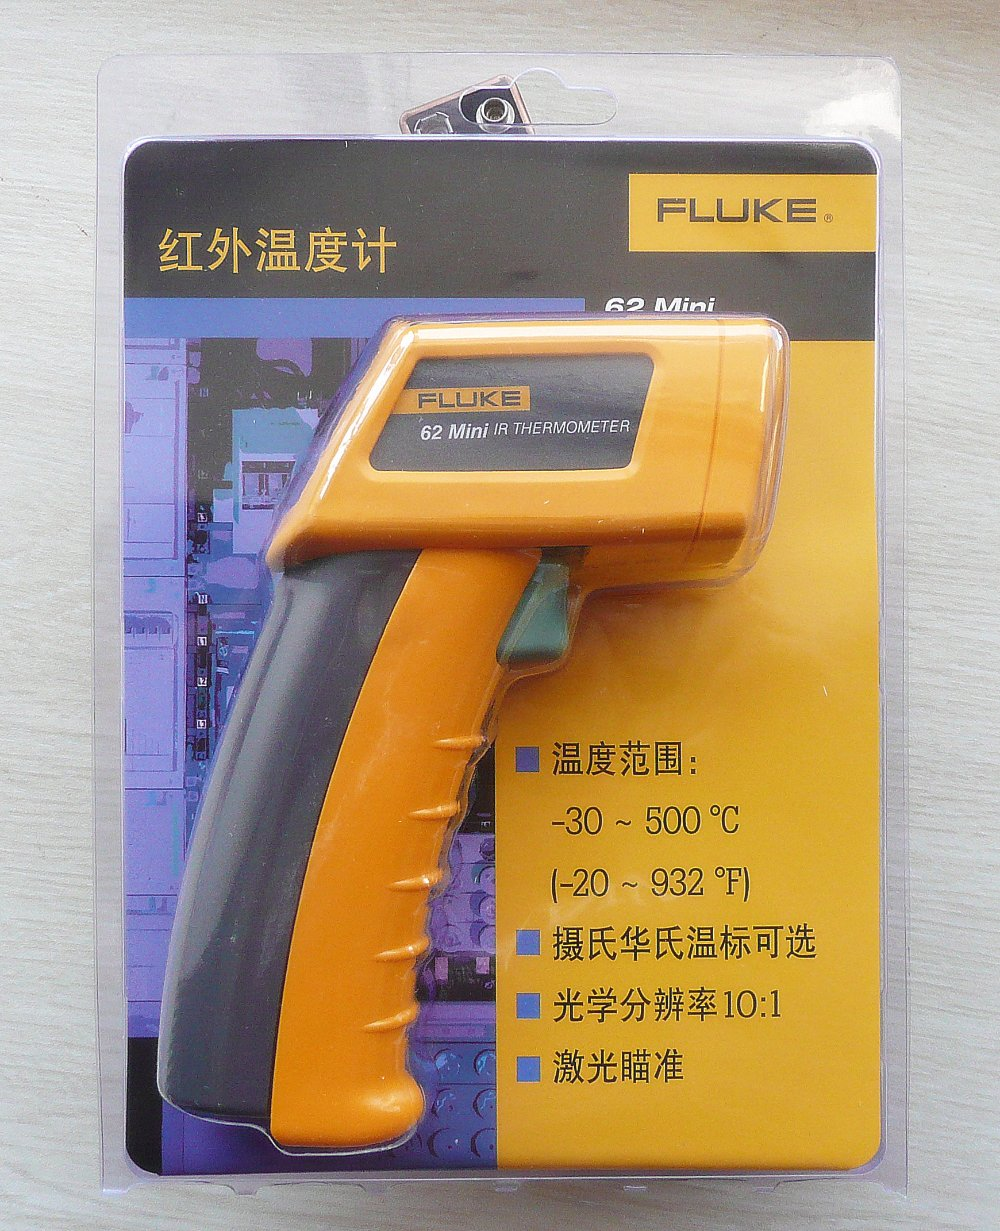 500 C Infrared Thermometers Fluke 62 Mini F